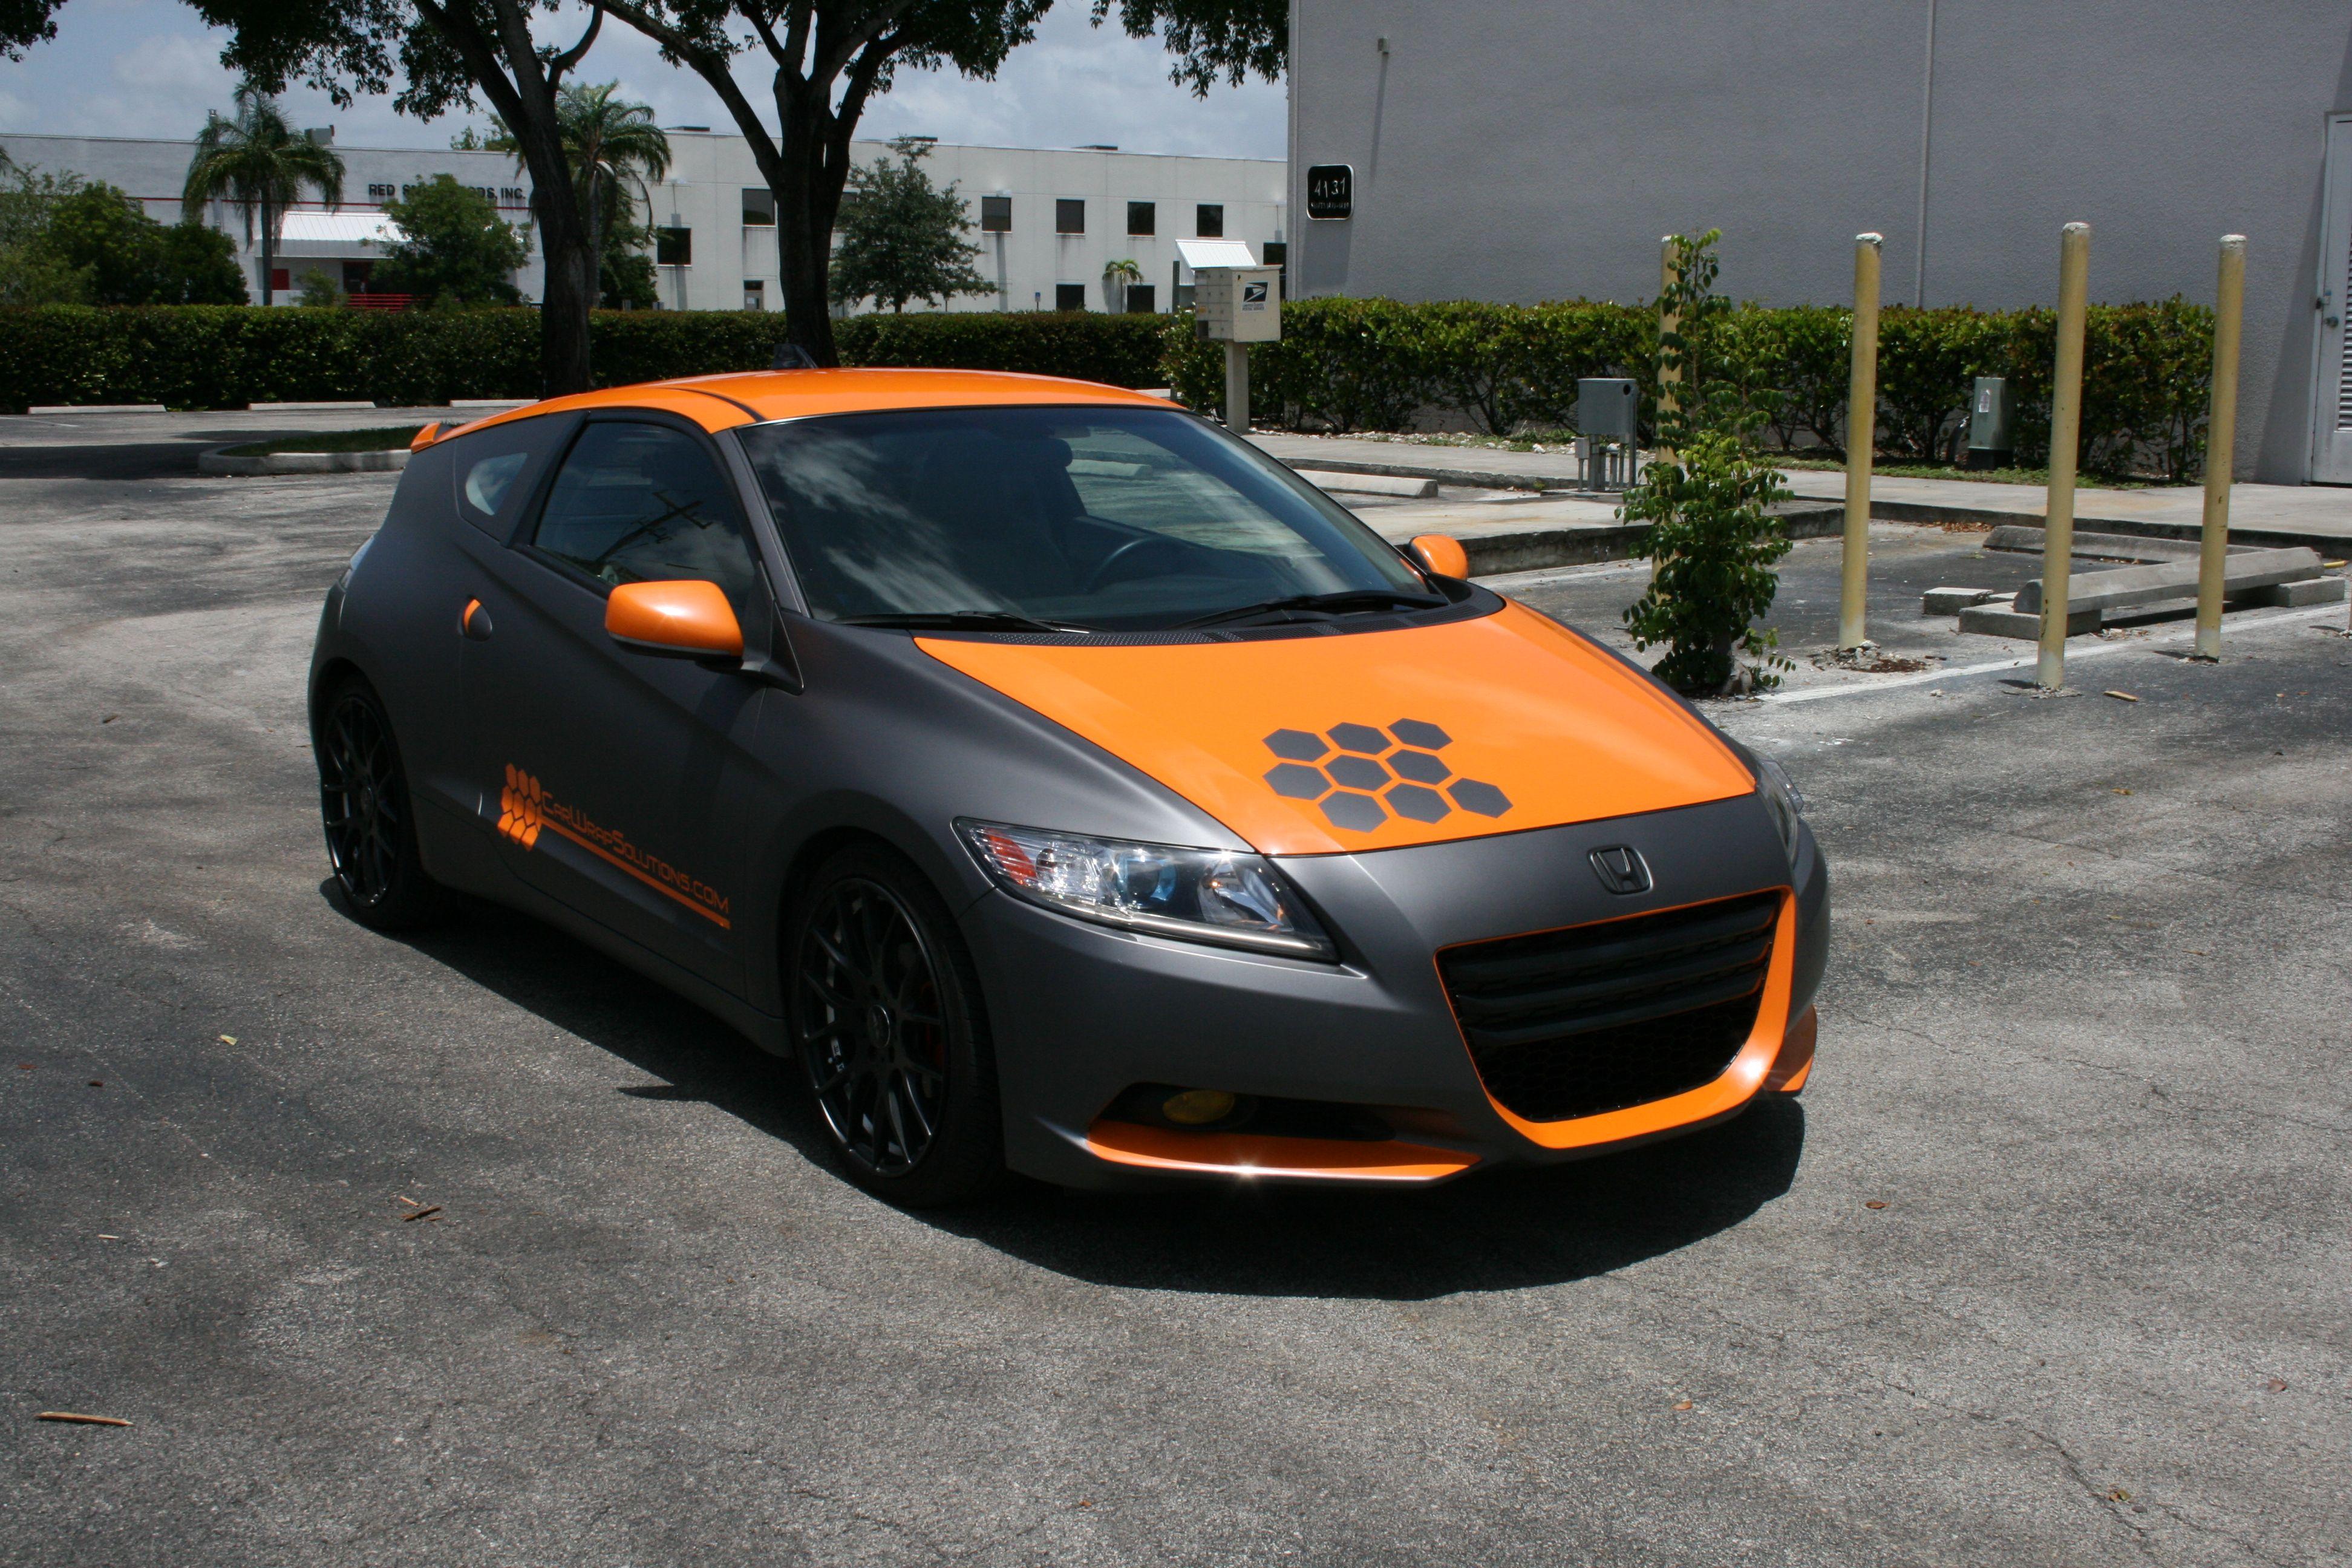 Custom Honda CRZ Miami Florida. 3M Matte Grey and Glossy